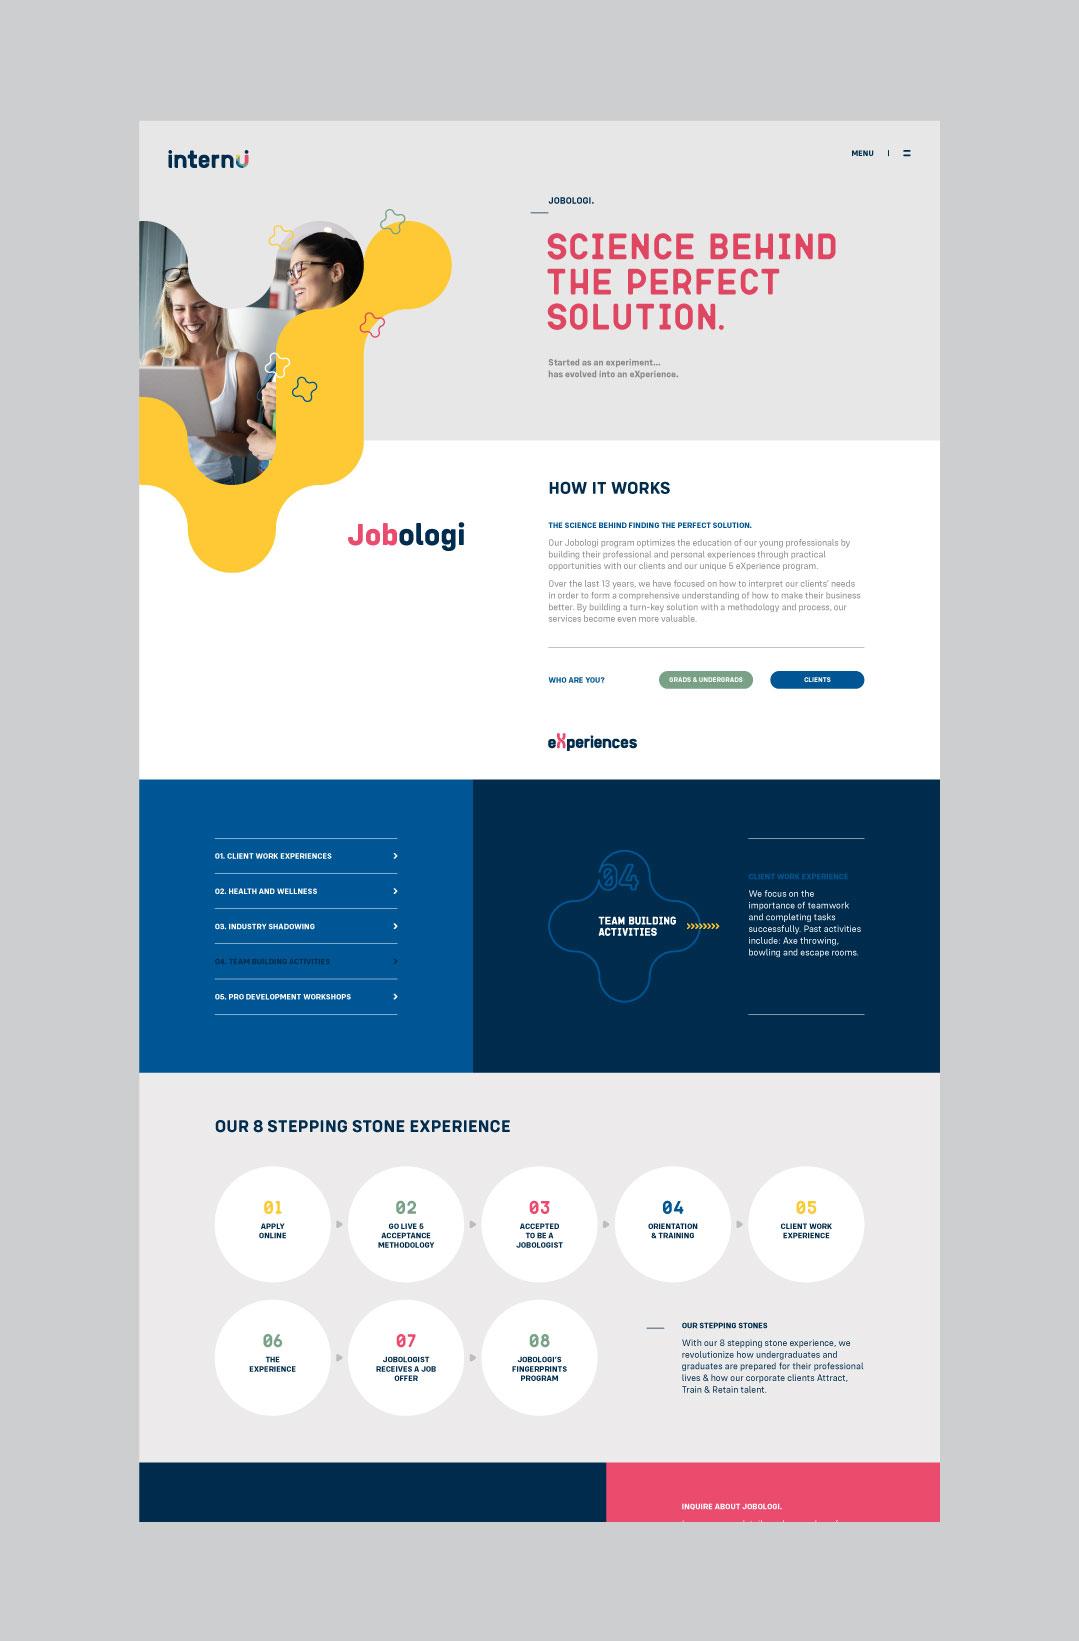 internU website showing the jobologi page design.